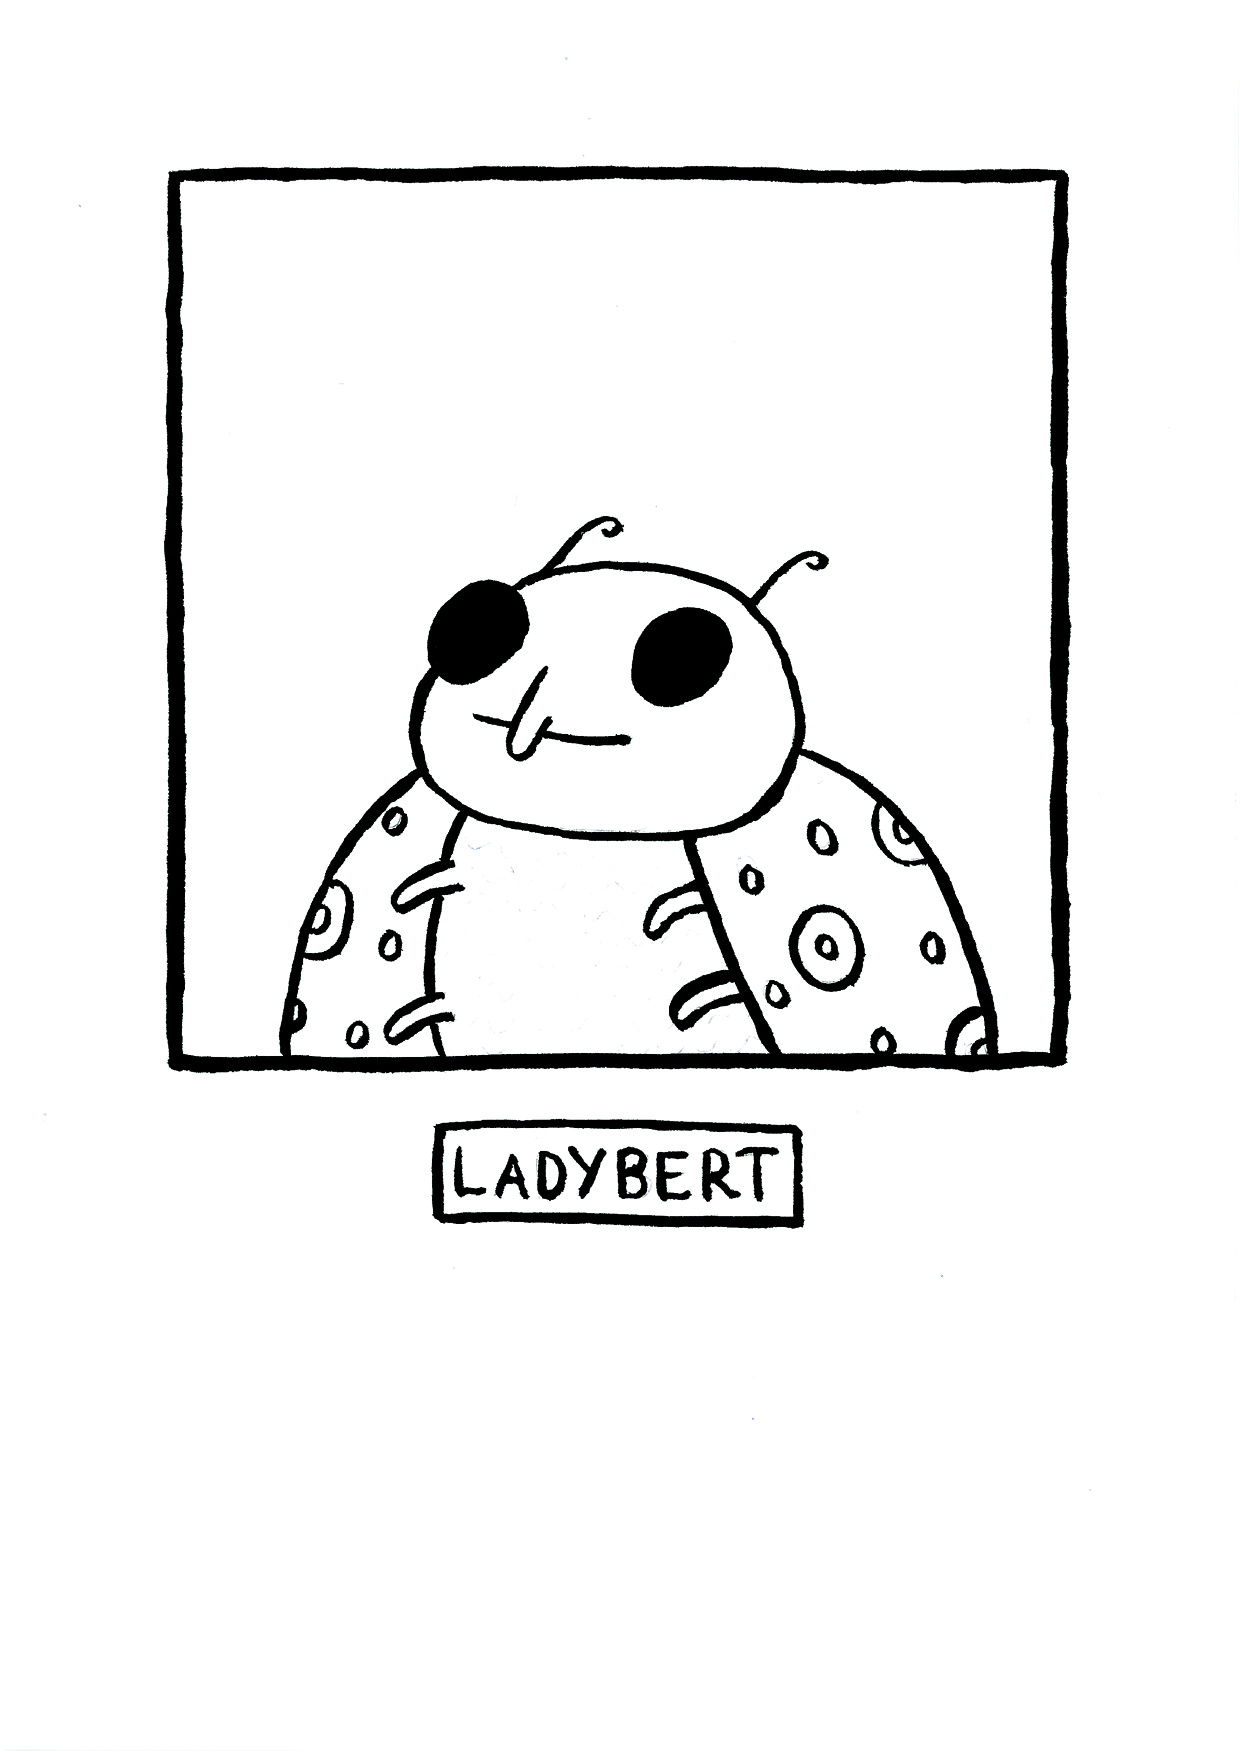 Ladybert